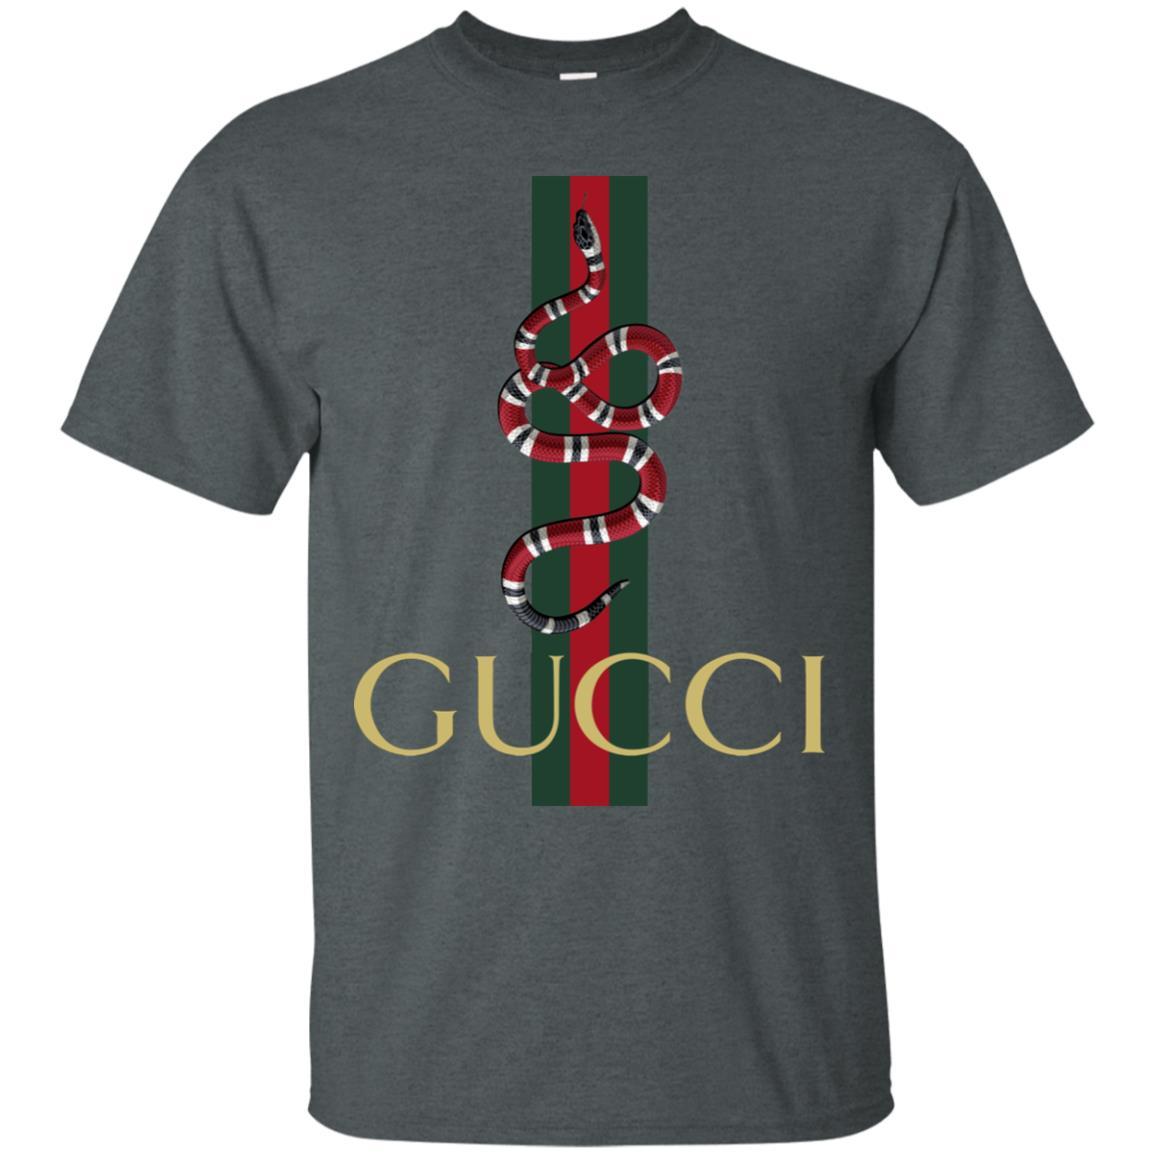 dadd47541c3c83 Gucci Snake shirt - image 4038 510x510